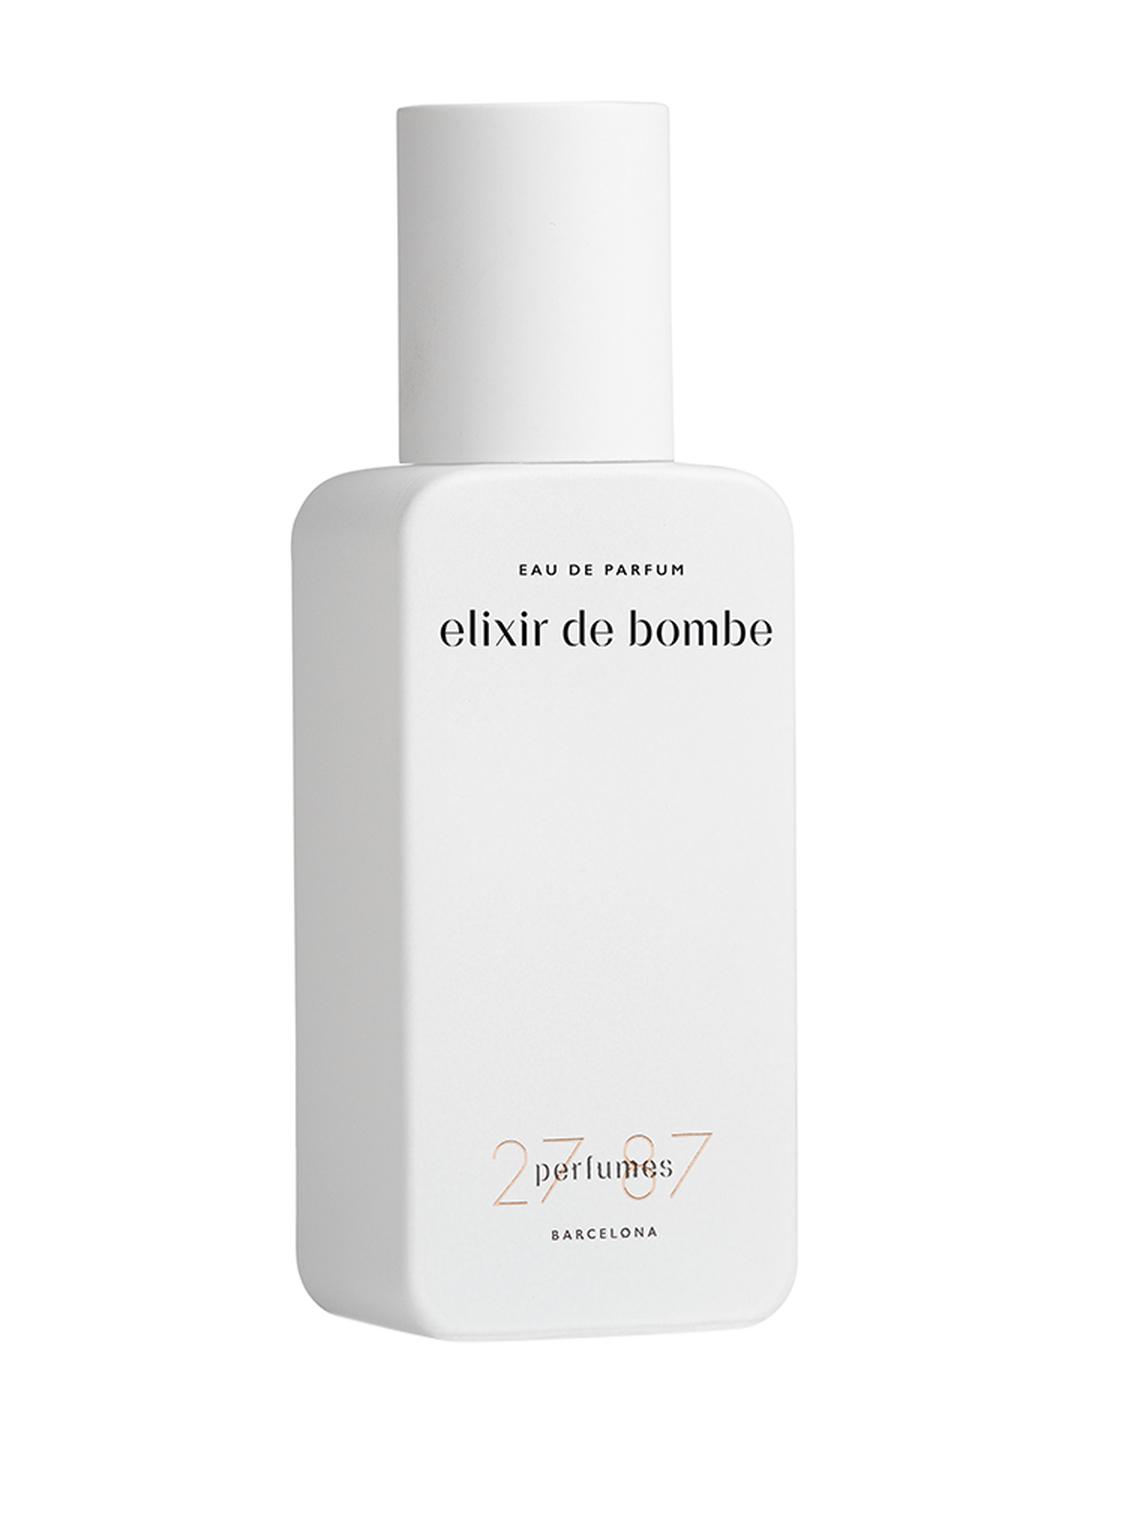 Image of 27 87 Perfumes Elixir De Bombe Eau de Parfum 27 ml